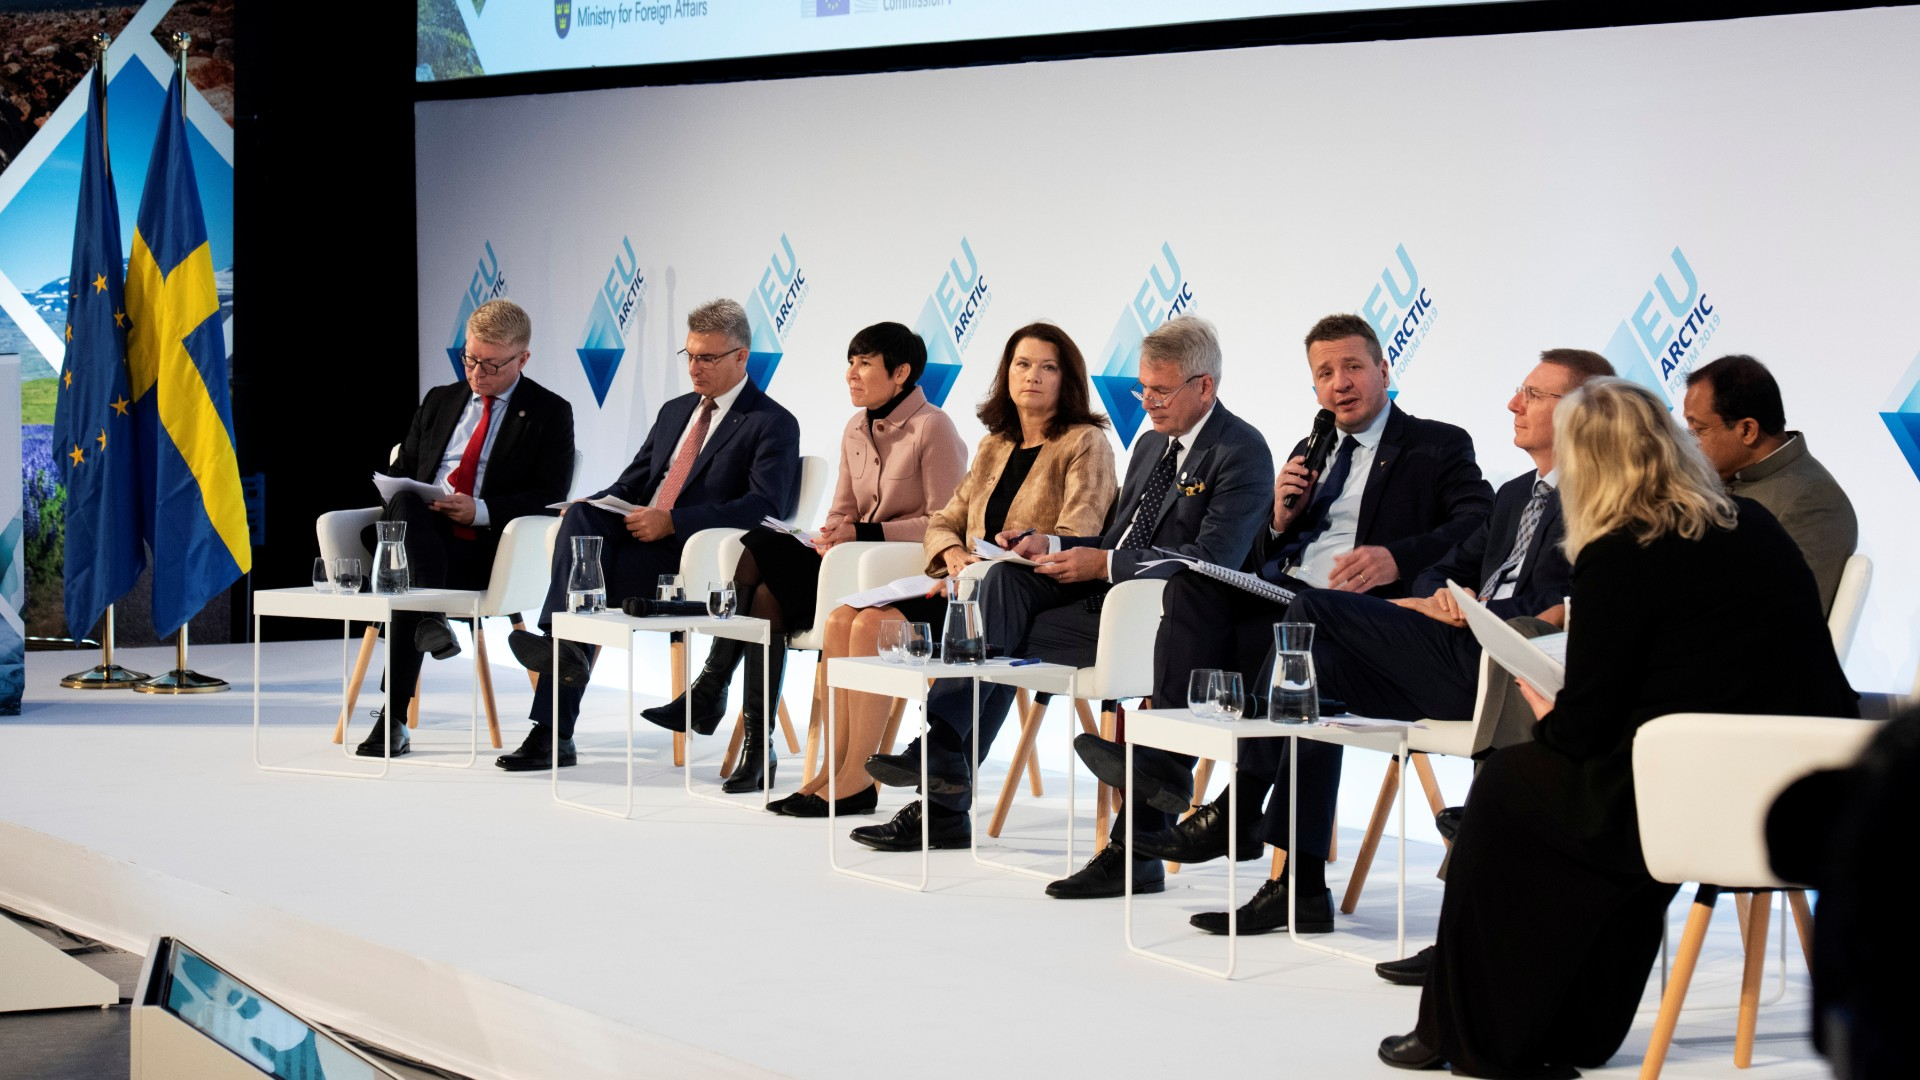 Sweden's FM calls for more EU involvement in Arctic as country hosts EU Arctic Forum